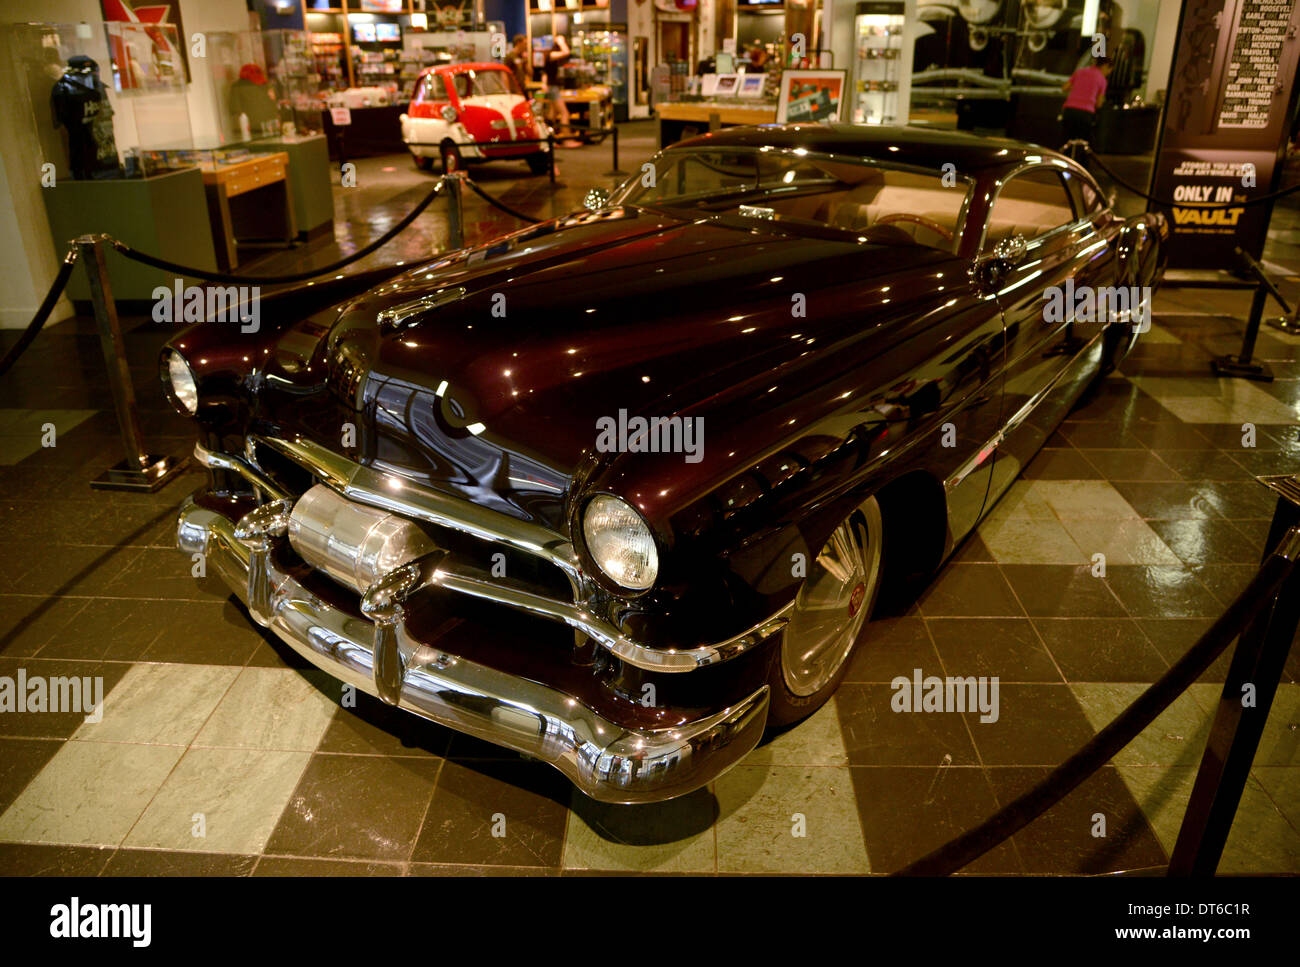 Cadzilla Zz Top Musician Billy Gibbons Custom 1948 Cadillac Car